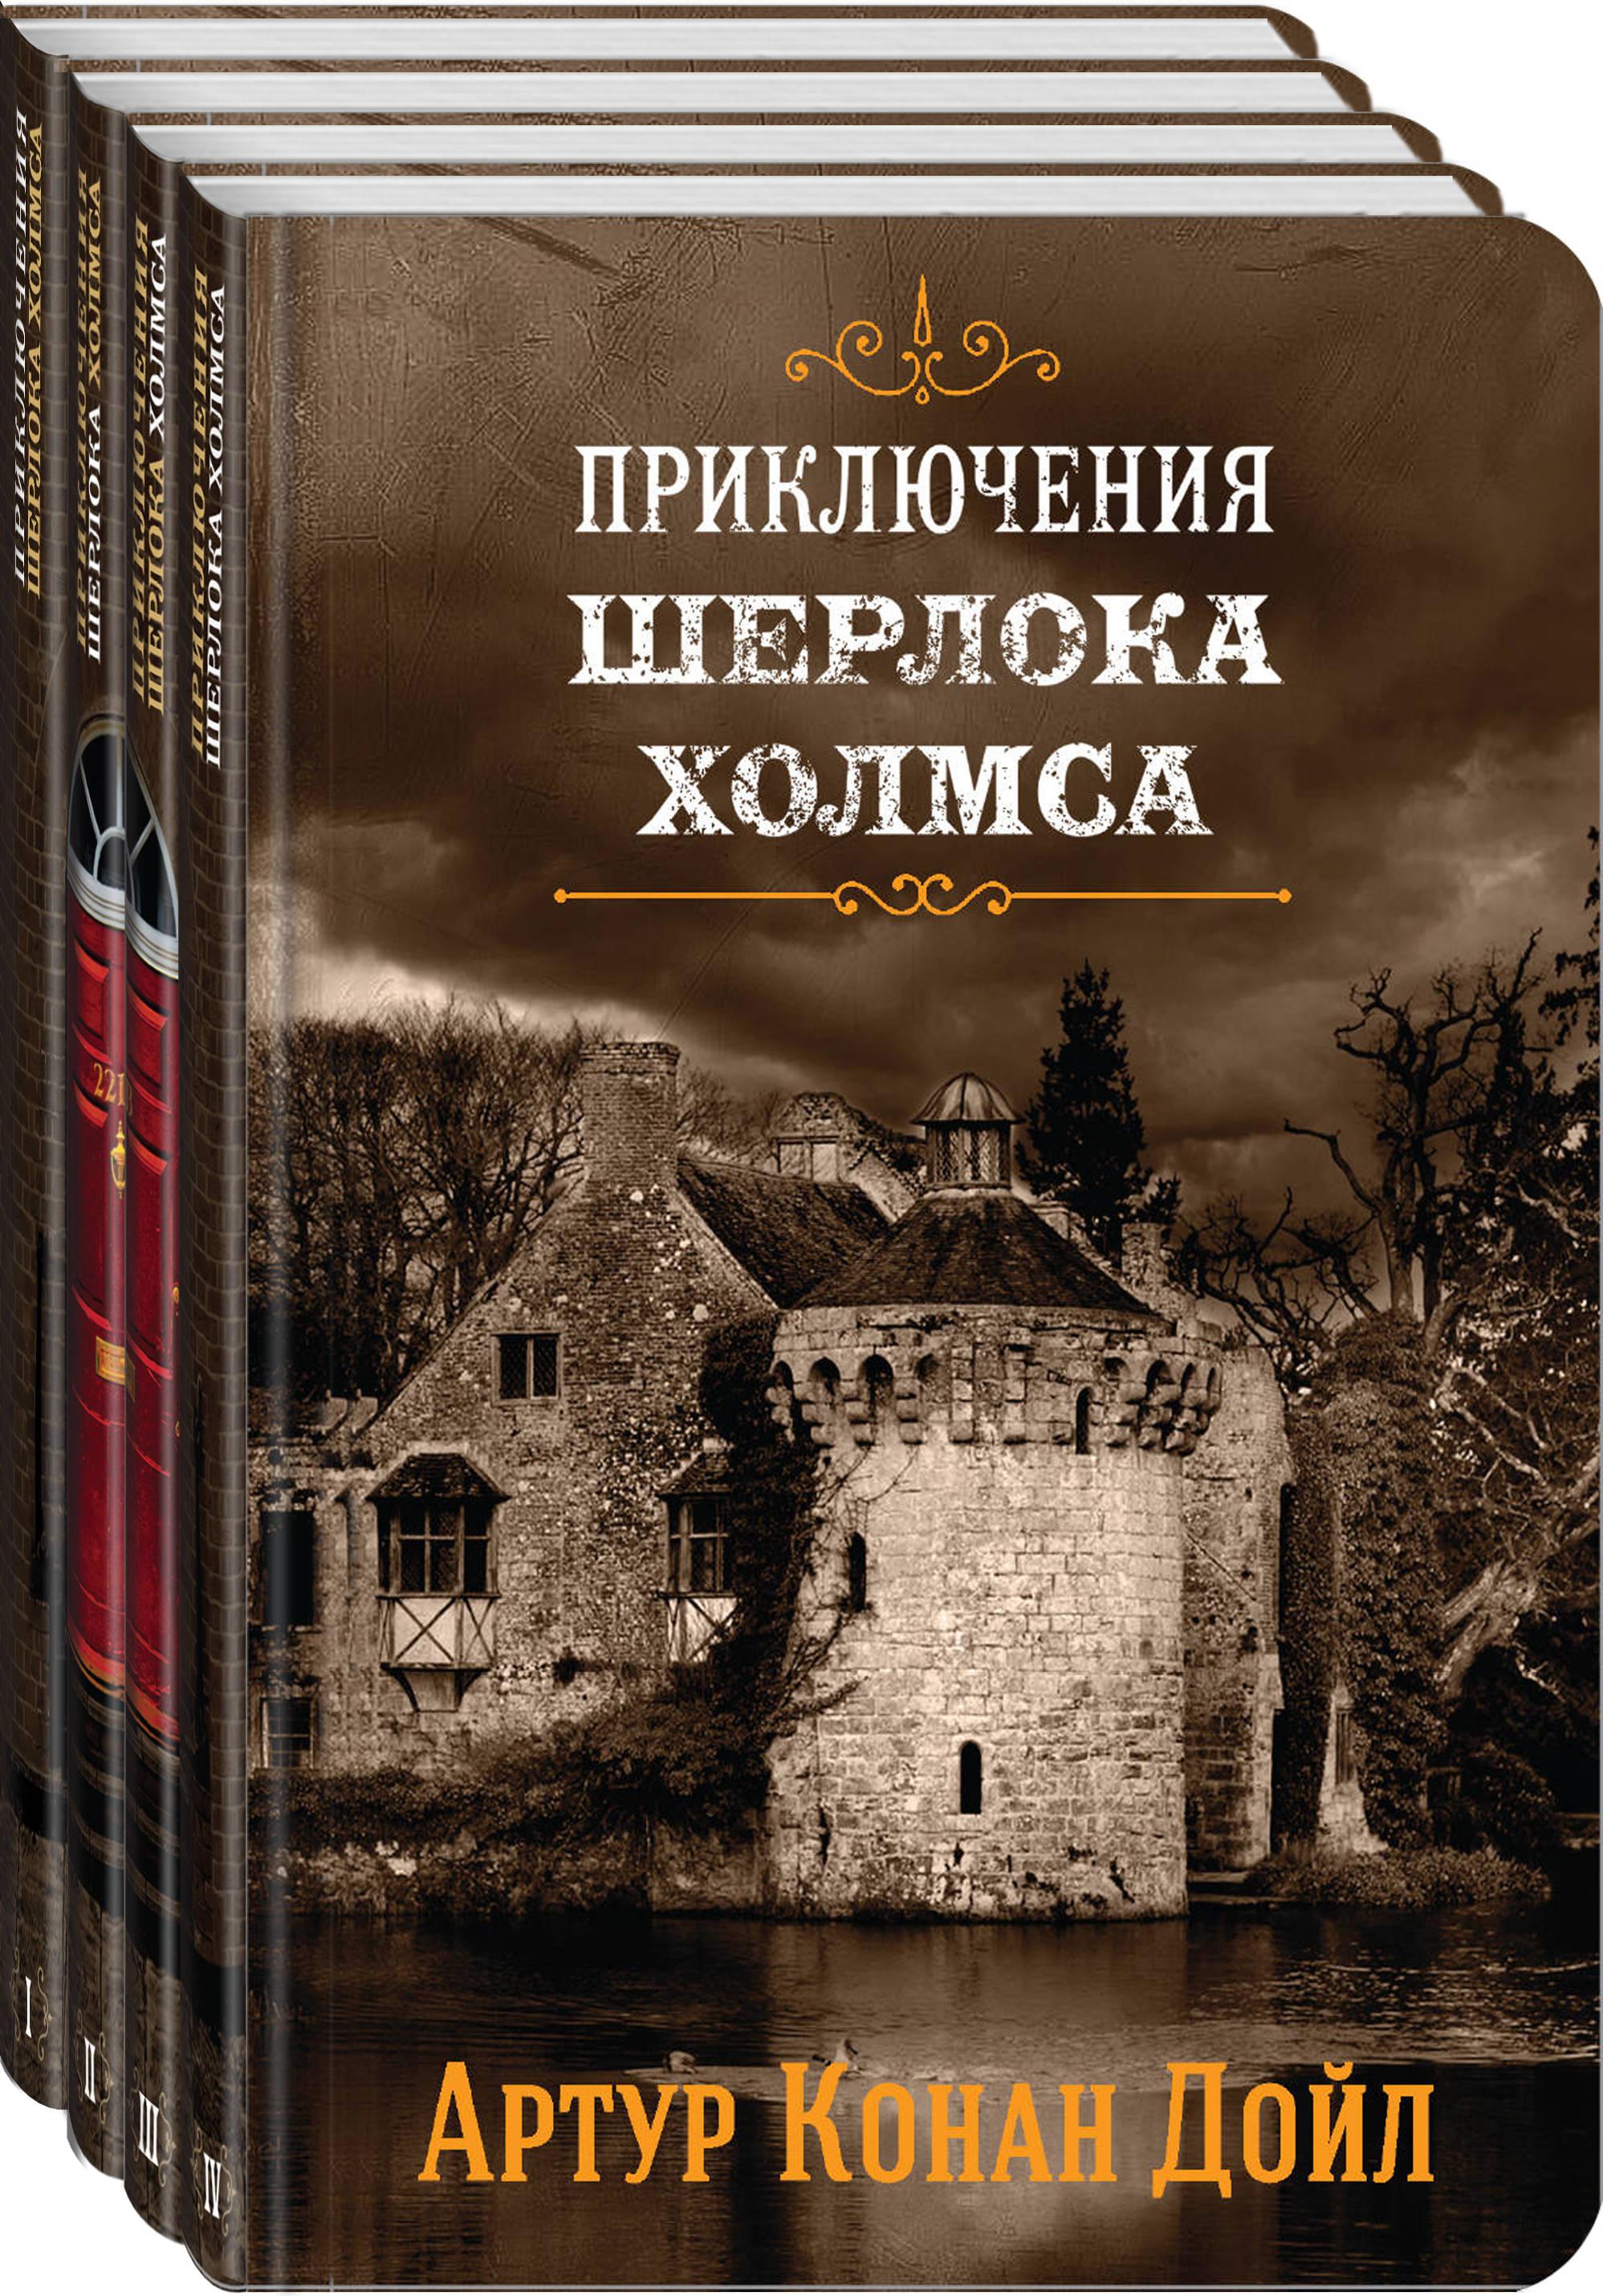 Приключения Шерлока Холмса. В 4-х томах (комплект)